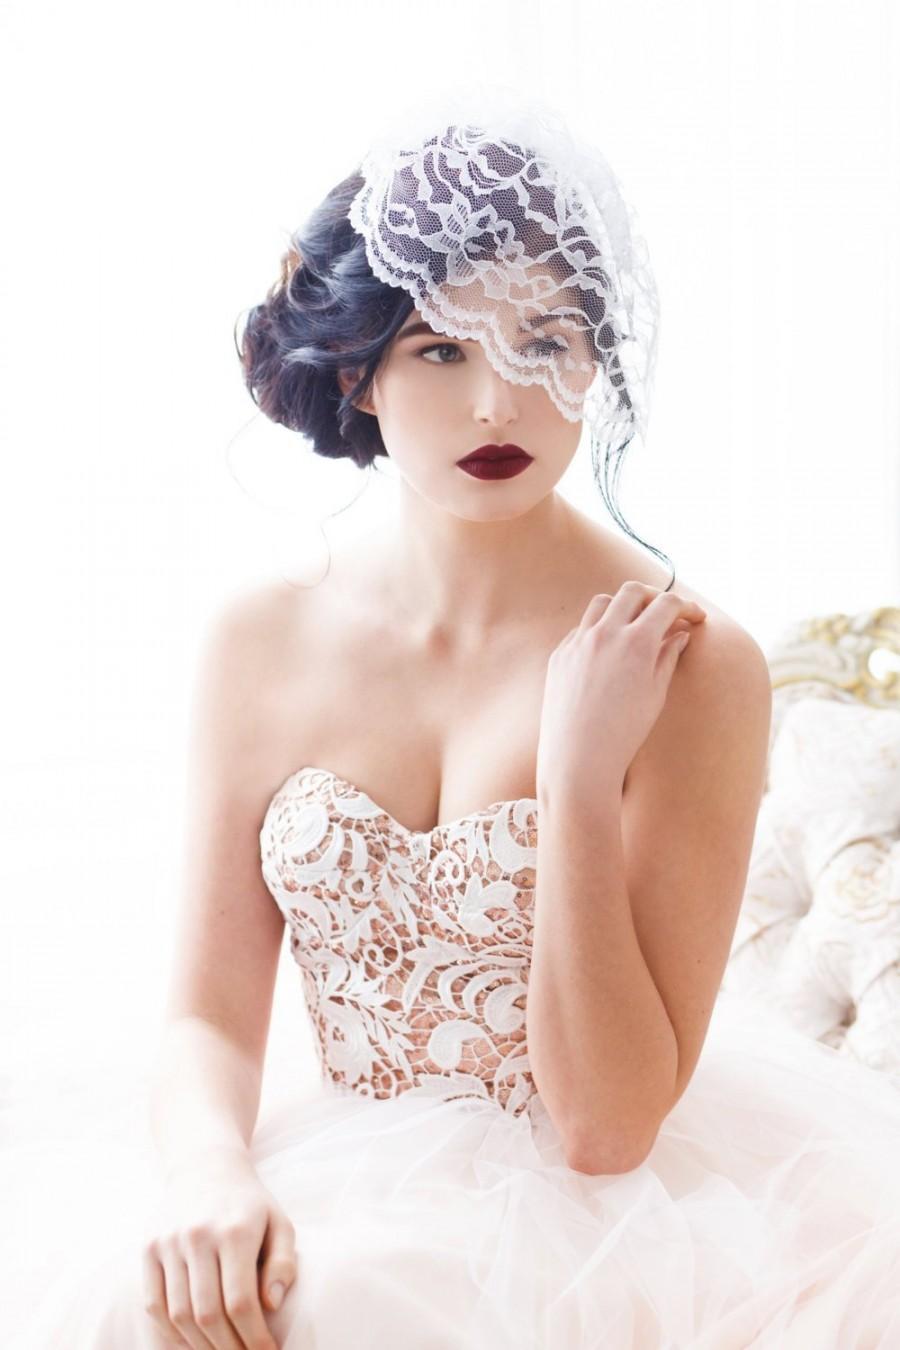 Wedding - Lace Birdcage Veil, Birdcage Veil, Birdcage Bridal Veil, Birdcage Veil Lace, Illusion Lace Veil, Lace Blusher, White, Black MEGGIE